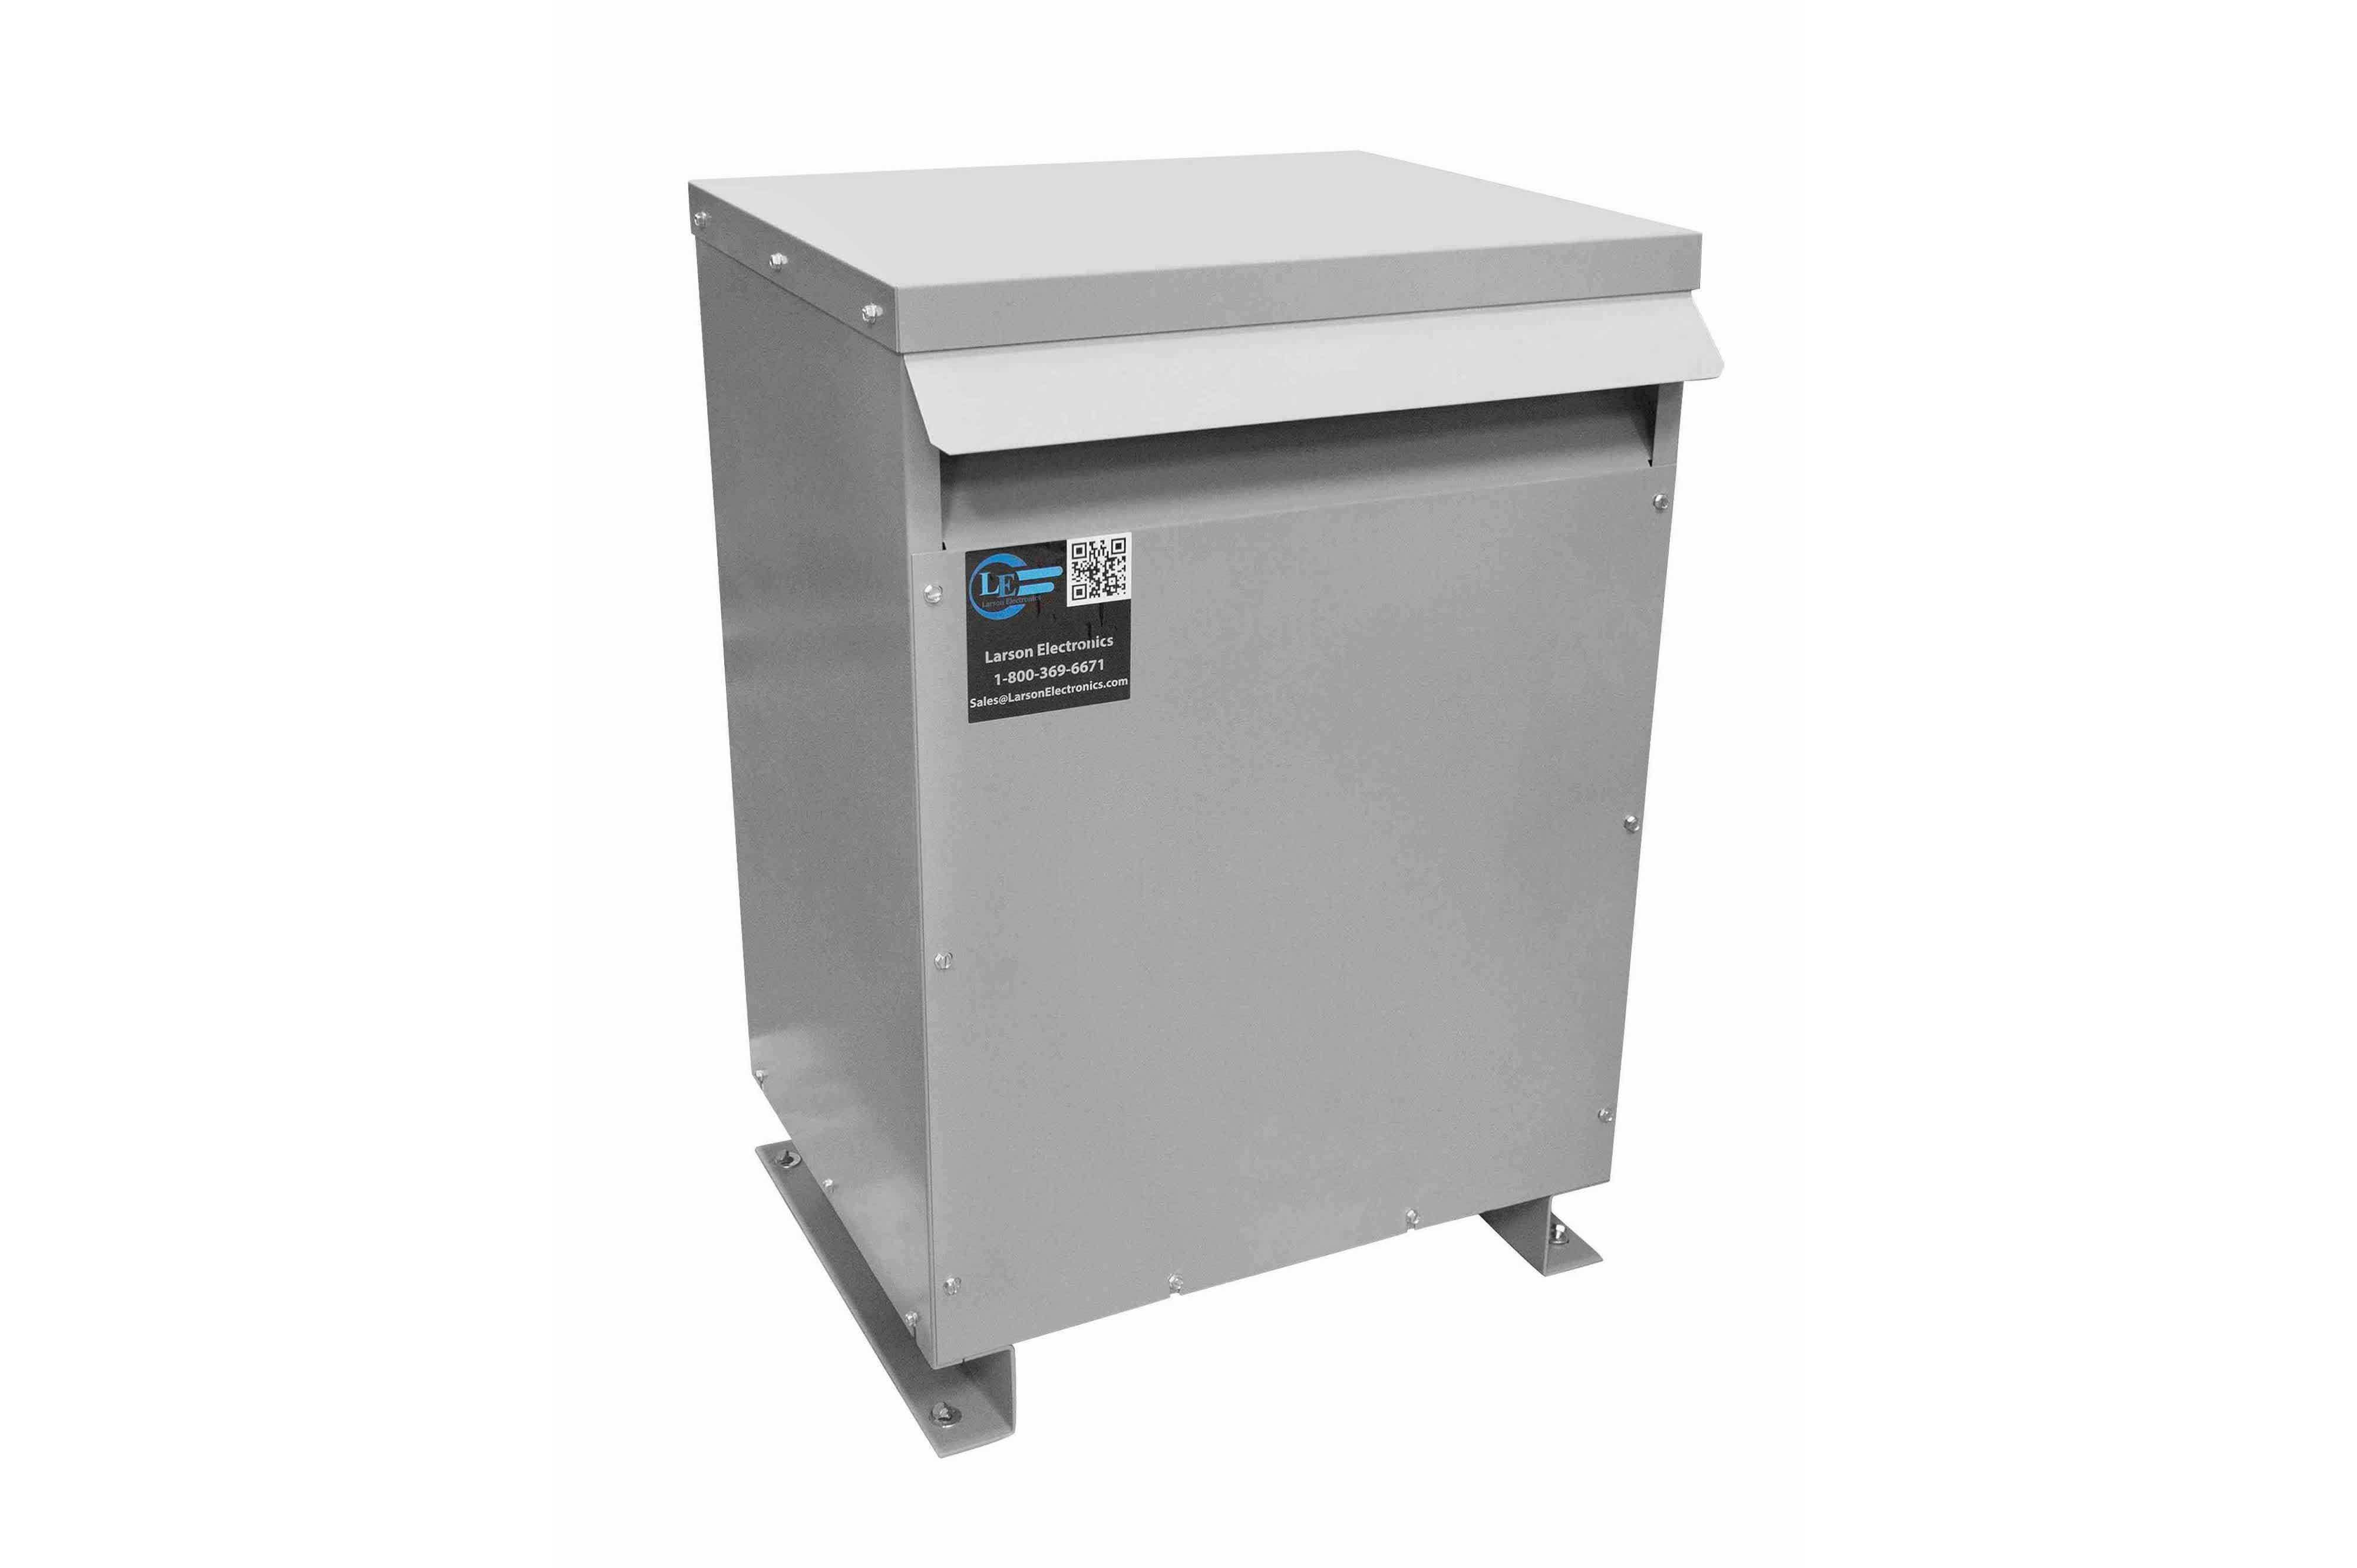 18 kVA 3PH Isolation Transformer, 440V Wye Primary, 240V Delta Secondary, N3R, Ventilated, 60 Hz